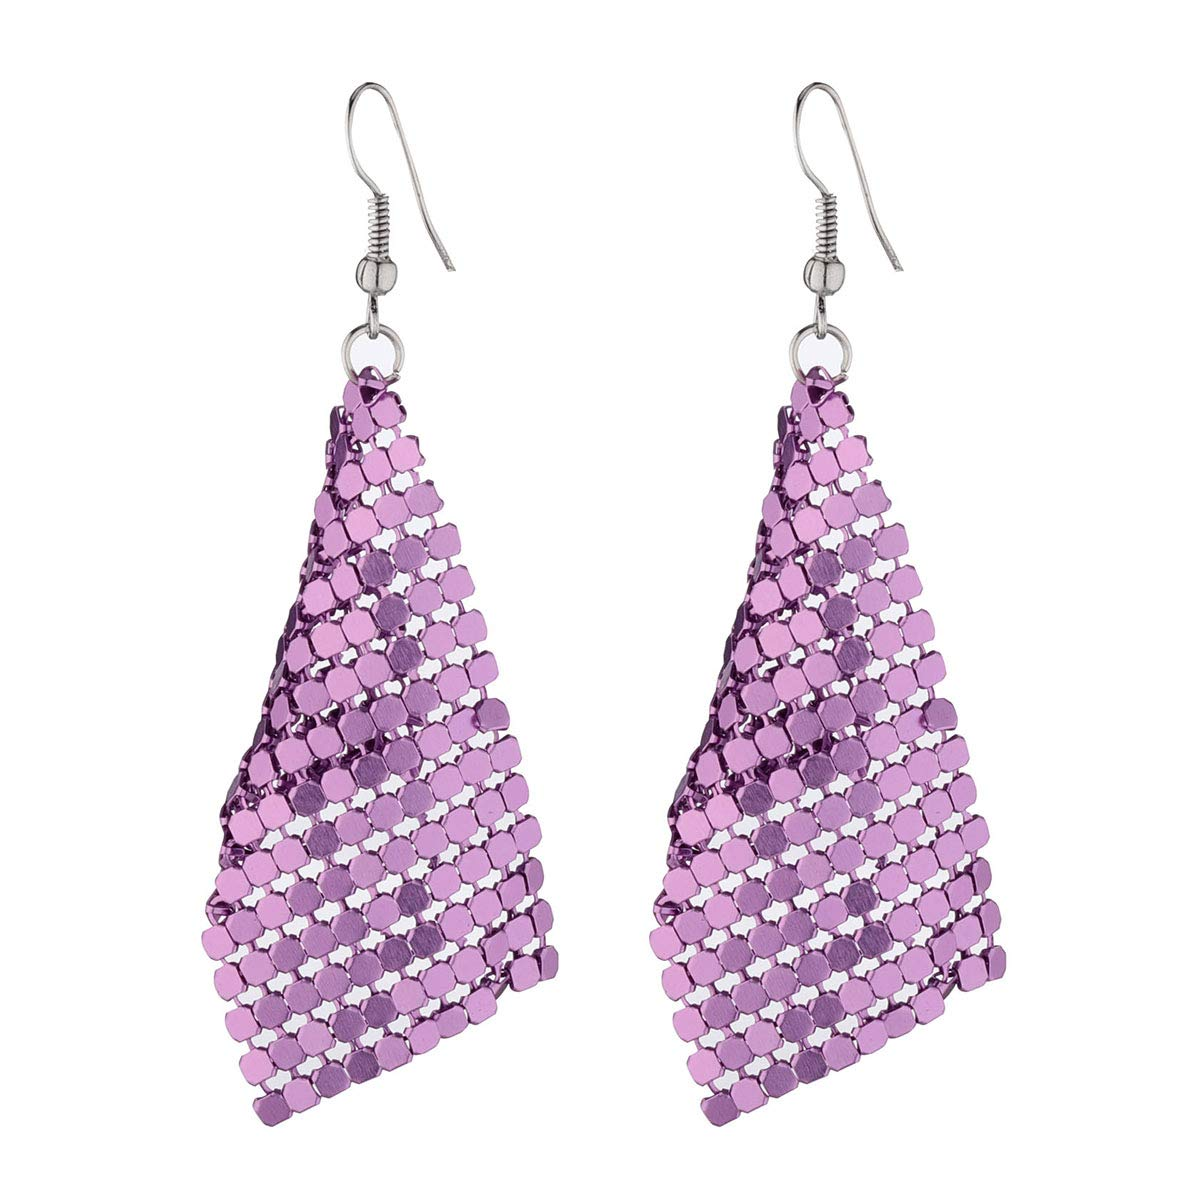 Eigso Drop Earrings Set for Women Girls Acrylic Geometric Stud Tassel Sequins Simple Classical